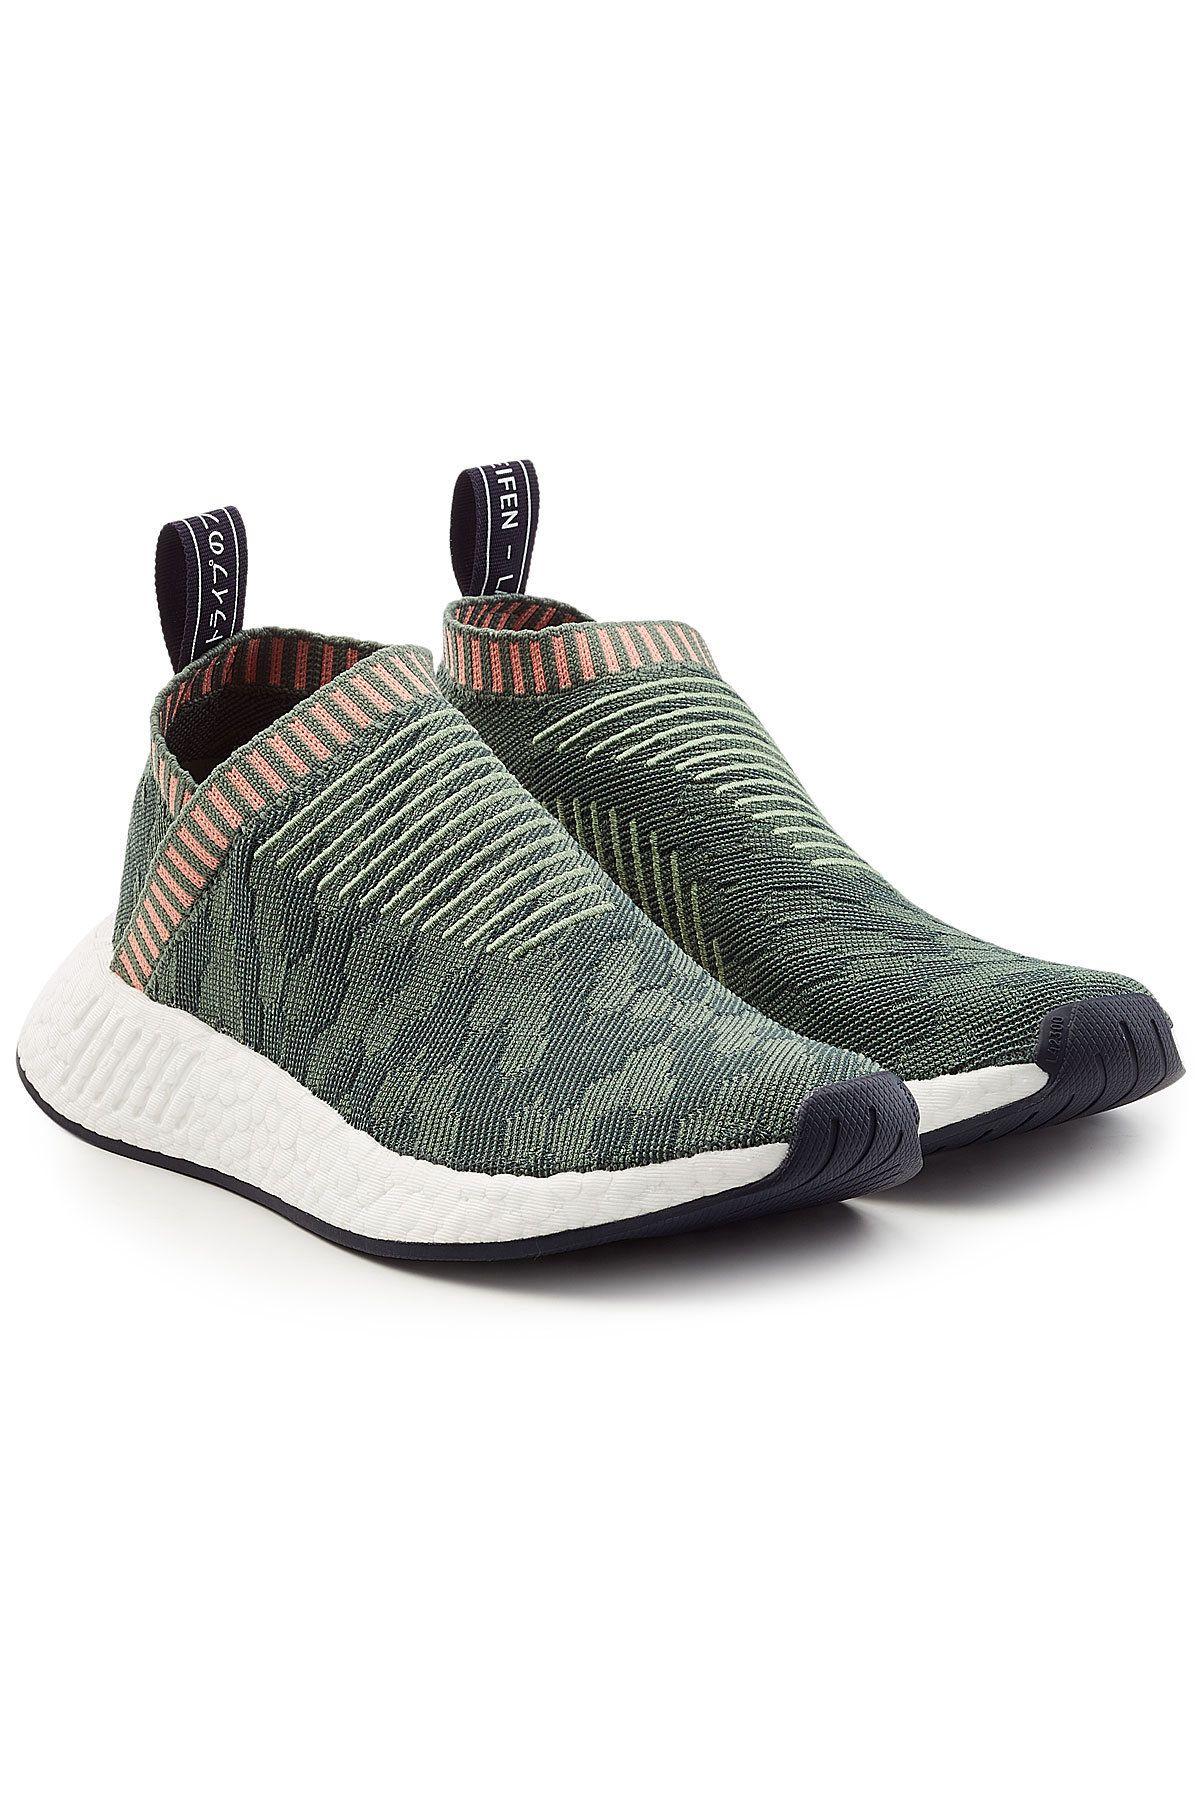 uomini cs2 nmd primeknit & reg; scarpe da ginnastica, verde nmd, adidas e originali.